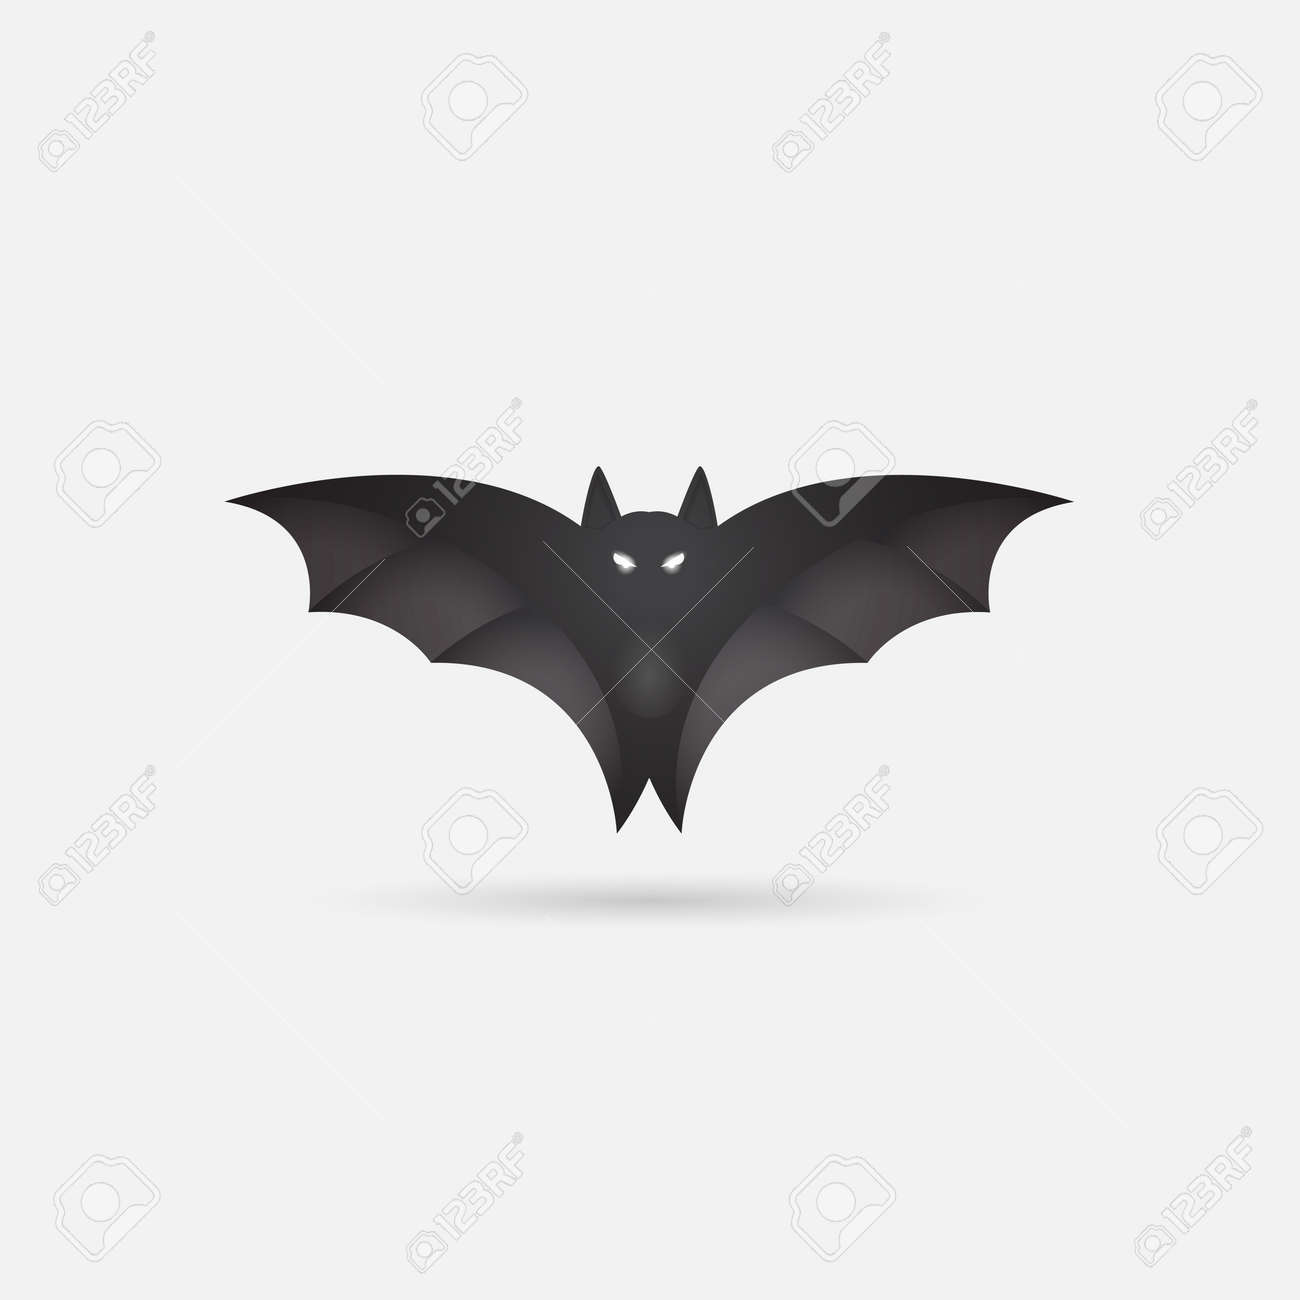 image regarding Printable Halloween Silhouettes referred to as Bat silhouette. Printable template. Bat icon isolated upon Grey.Halloween..